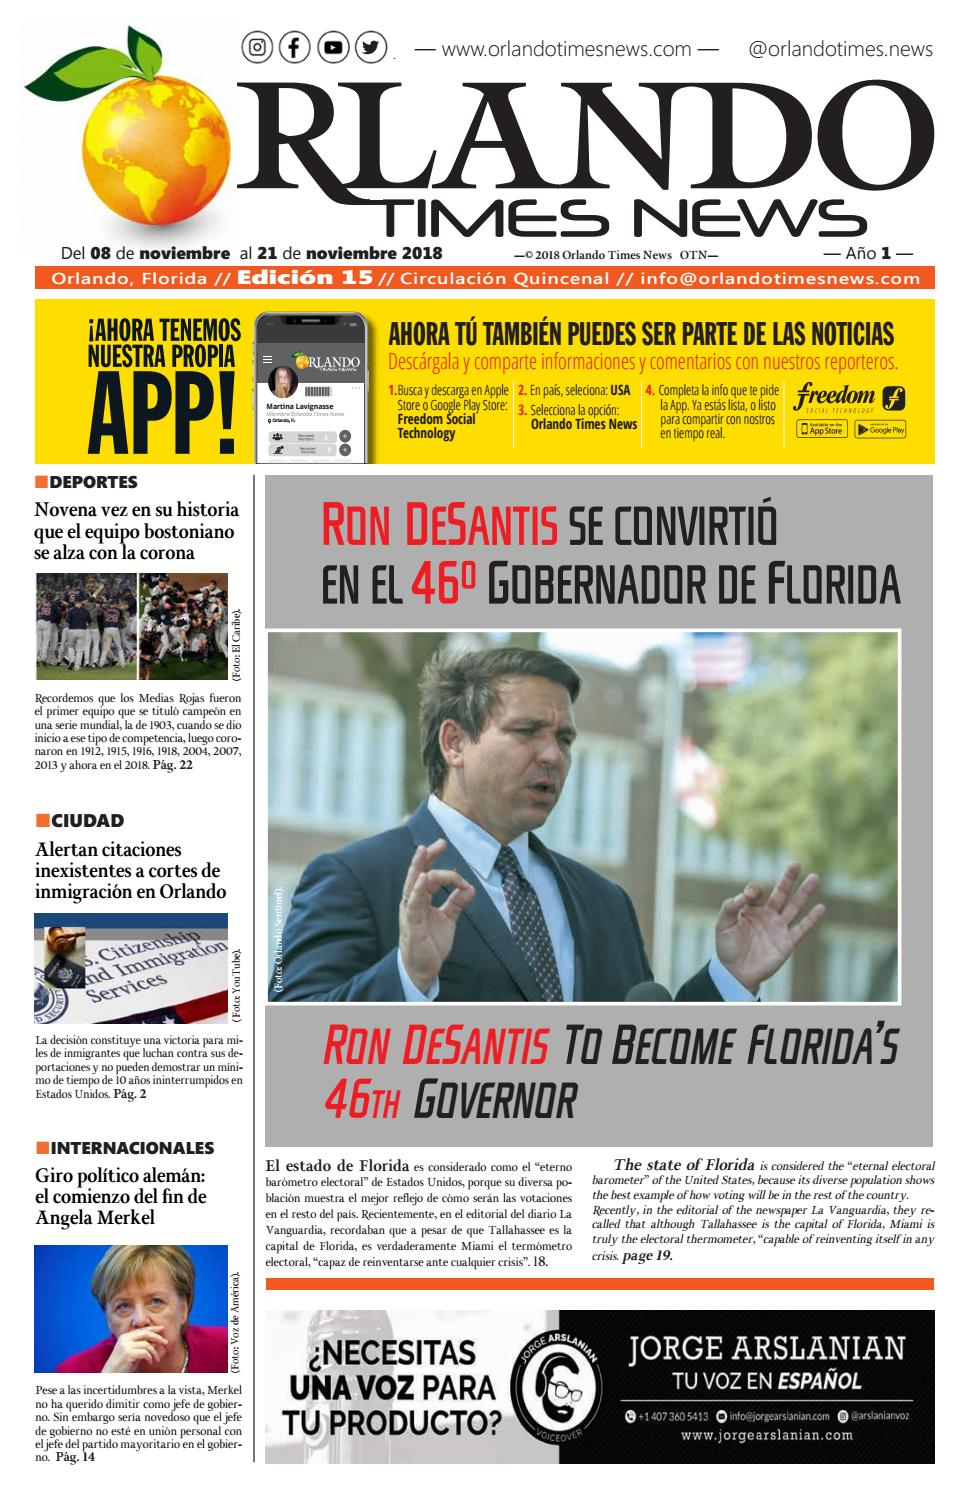 b4750b34d Edición 15 Orlando Times News by orlandotimesnews - issuu